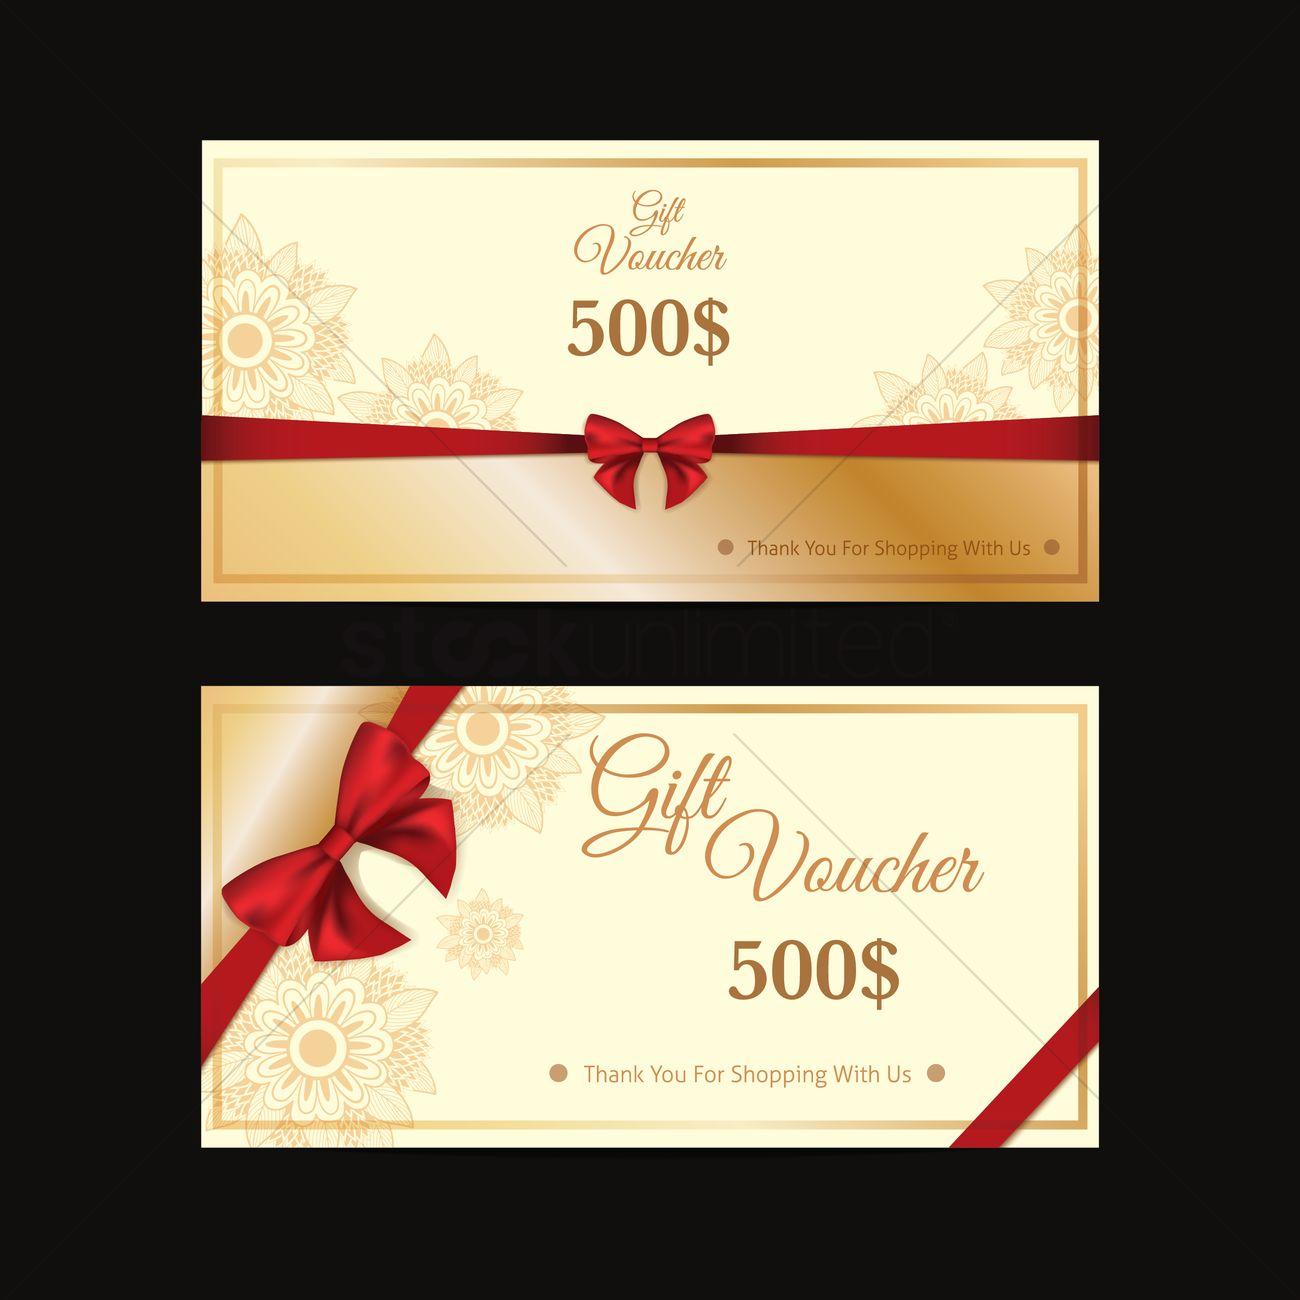 Voucher Coupon Coupons Vouchers Gift Certificate Design Designs – Voucher Designs